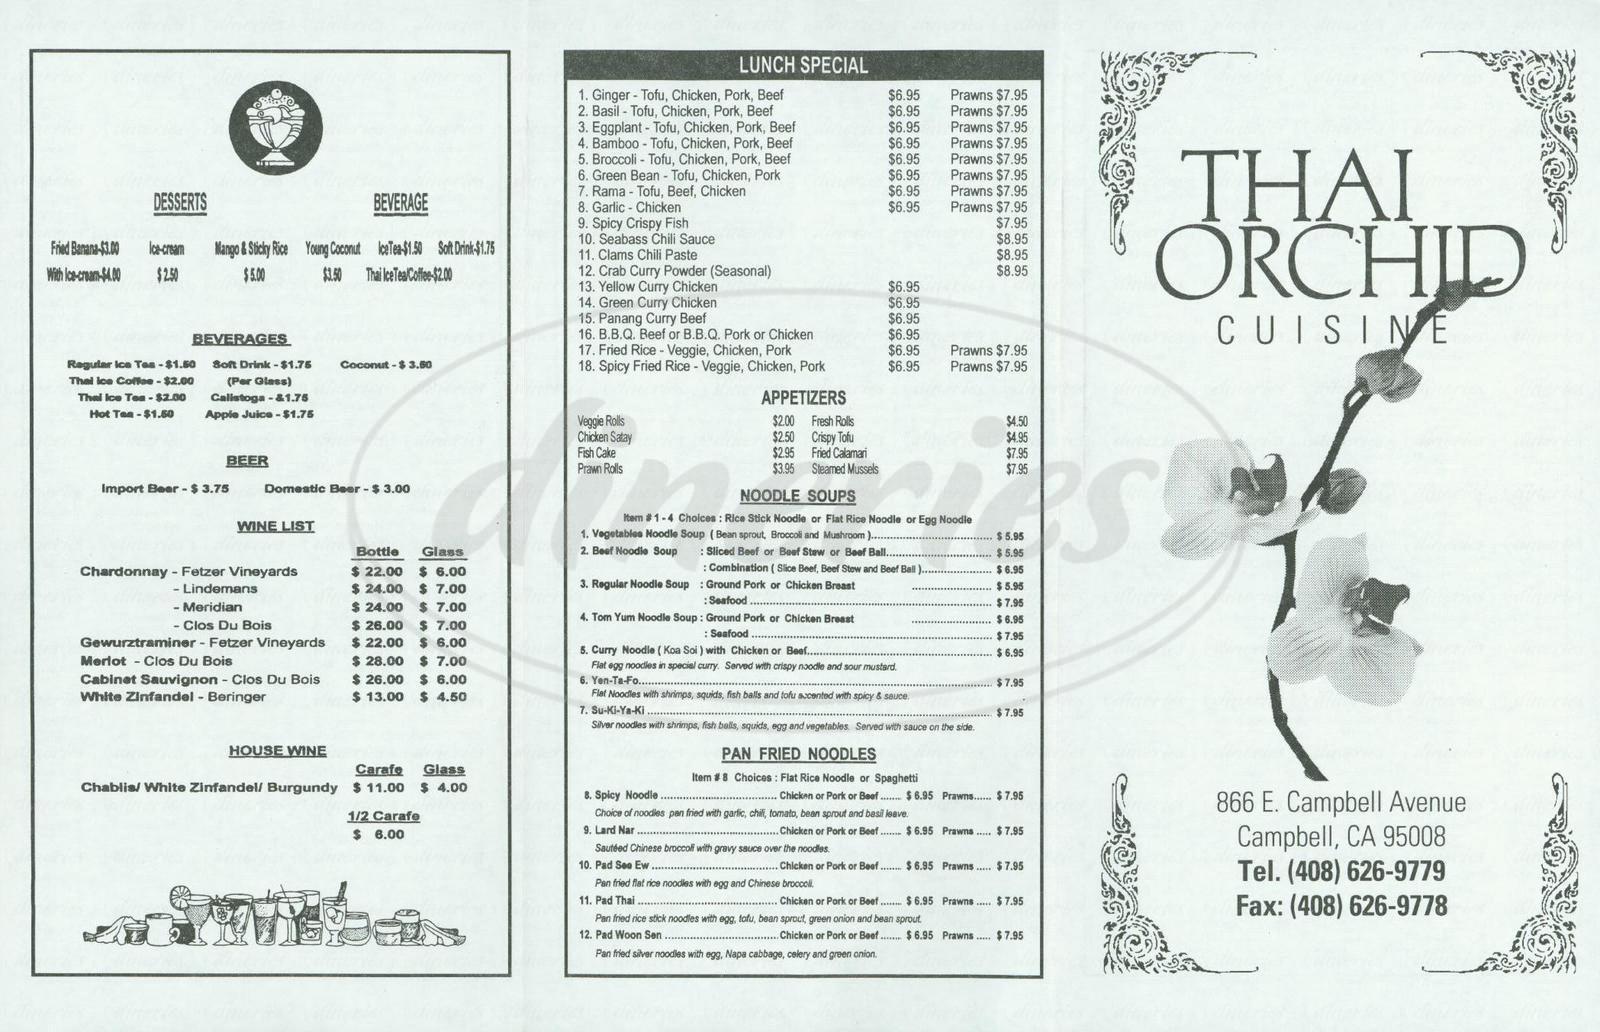 menu for Thai Orchid Cuisine